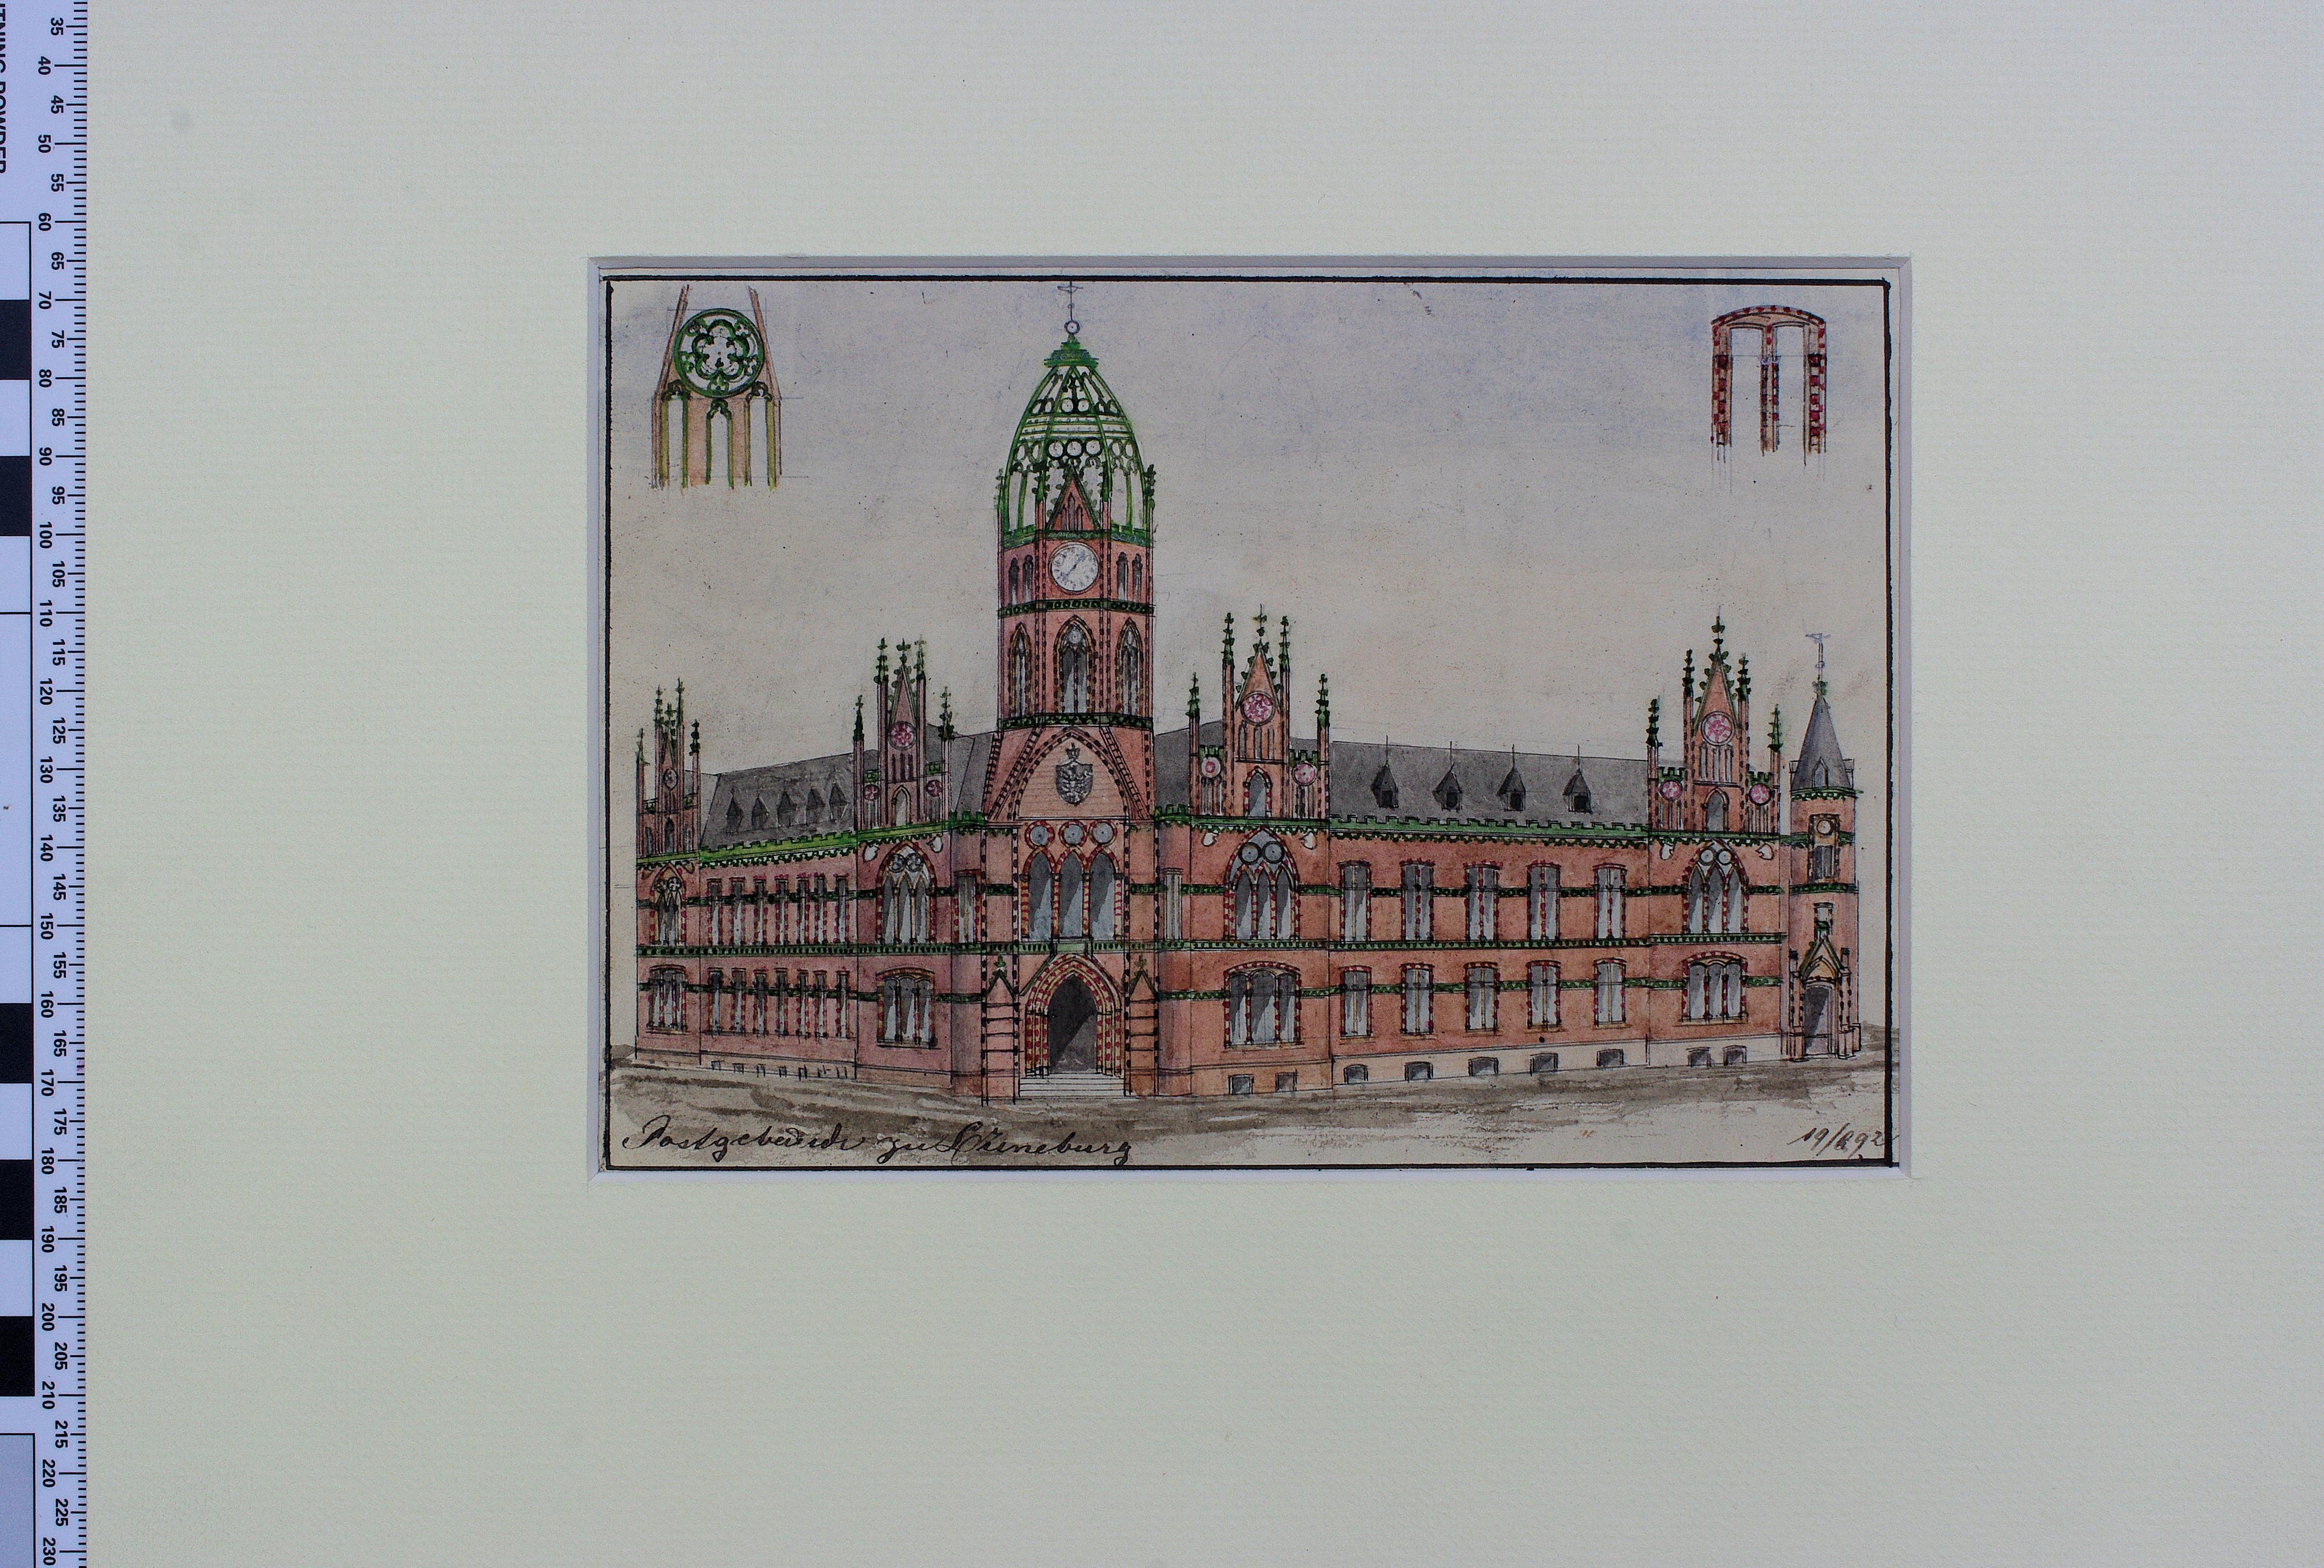 File:Lüneburg Postgebäude 9066.jpg - Wikimedia Commons